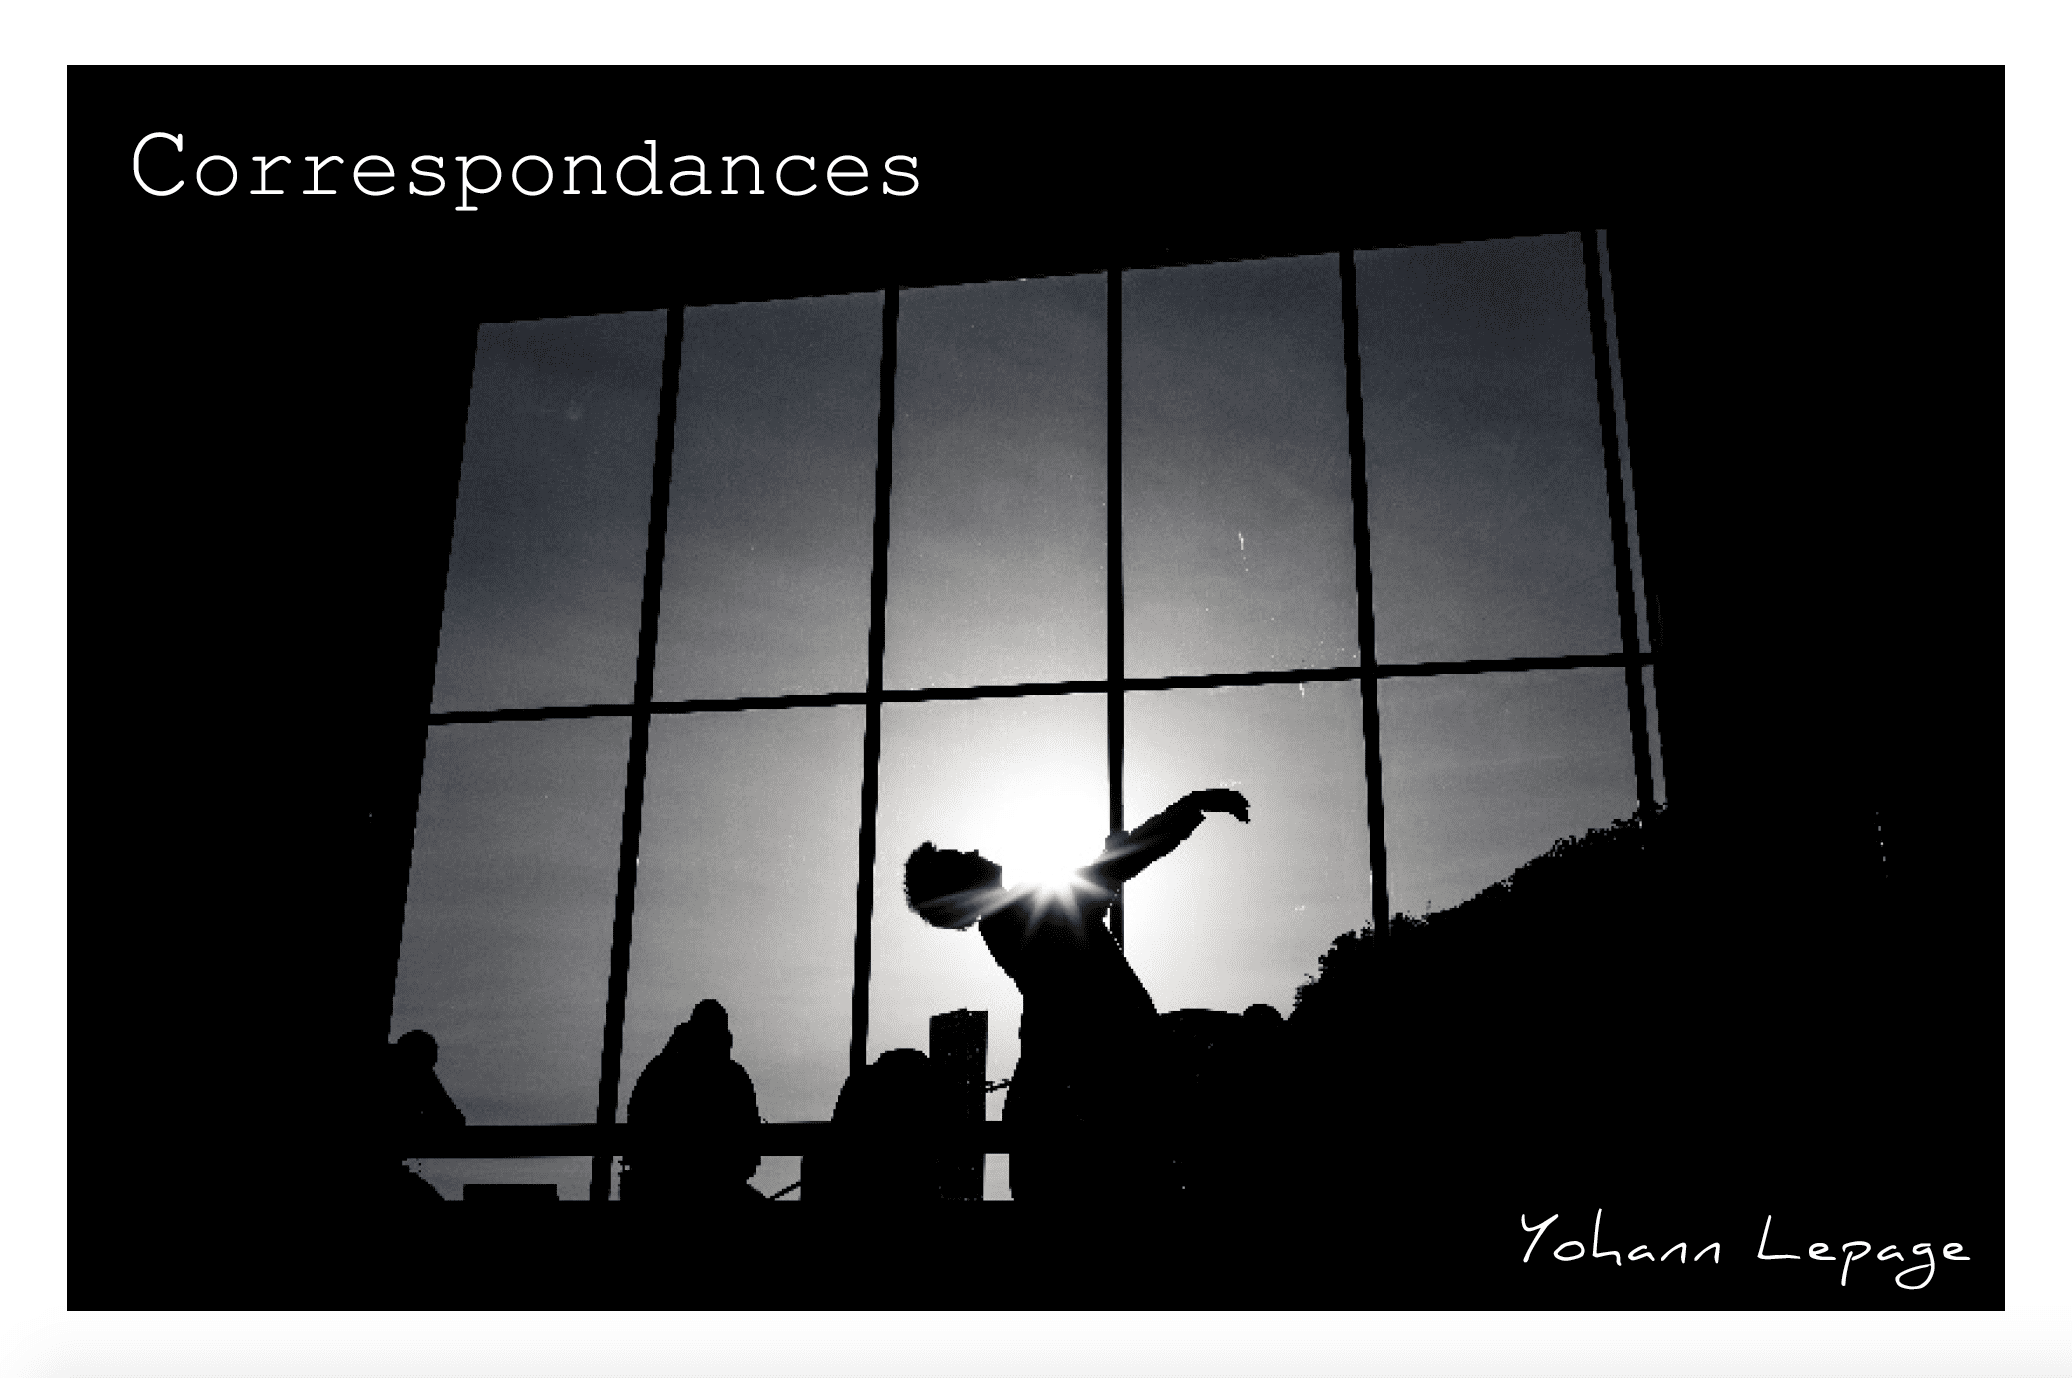 Correspondances par Yohann Lepage